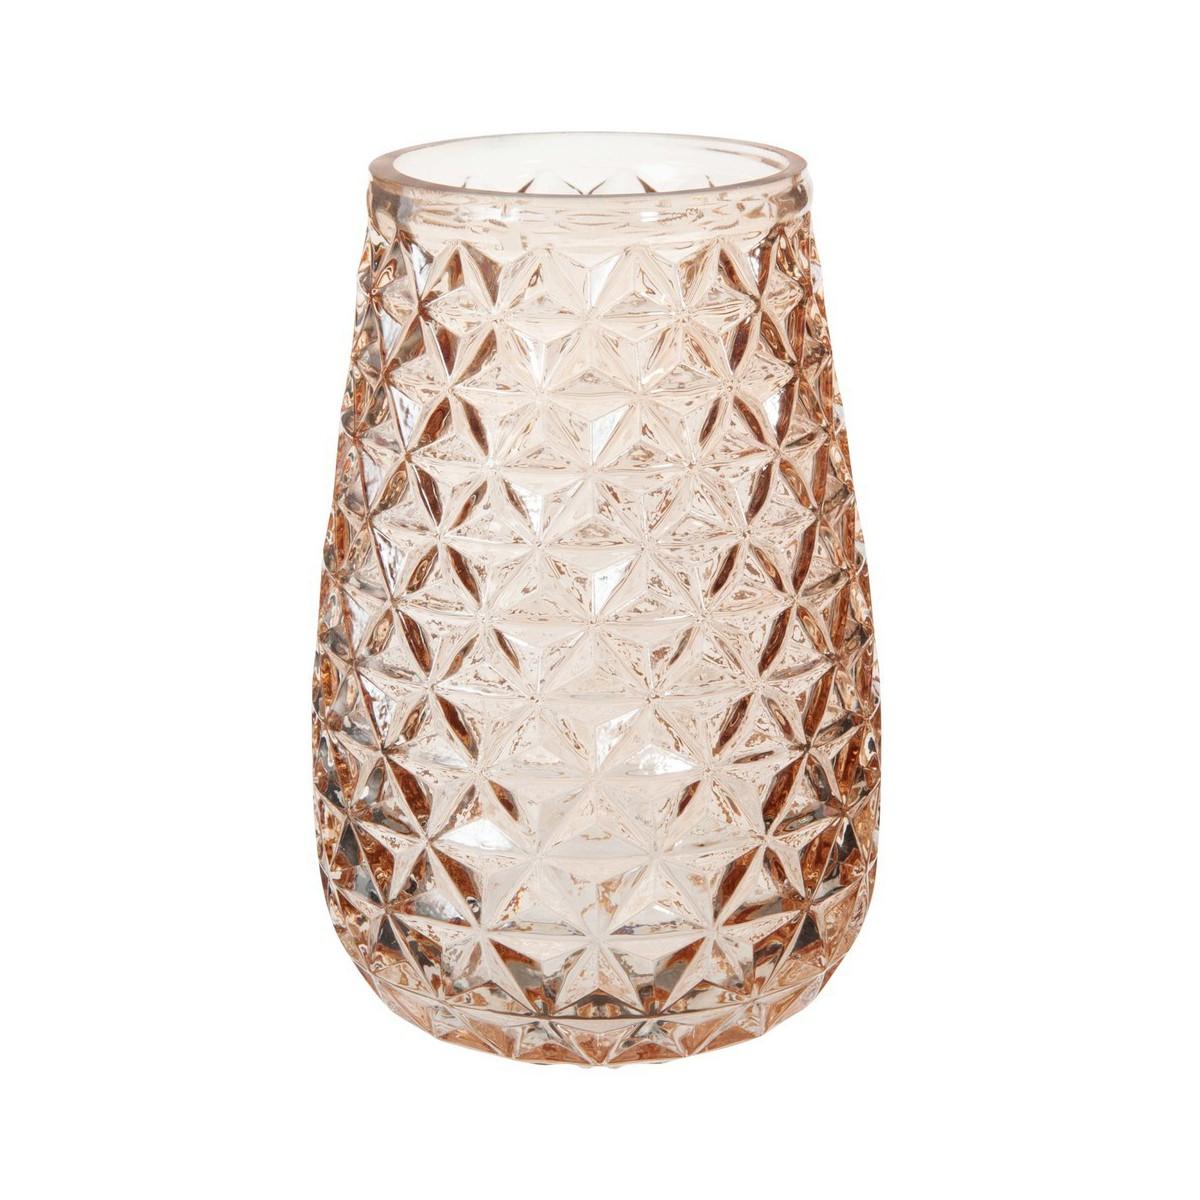 vase maisons du monde vase cylindrique maison du monde. Black Bedroom Furniture Sets. Home Design Ideas